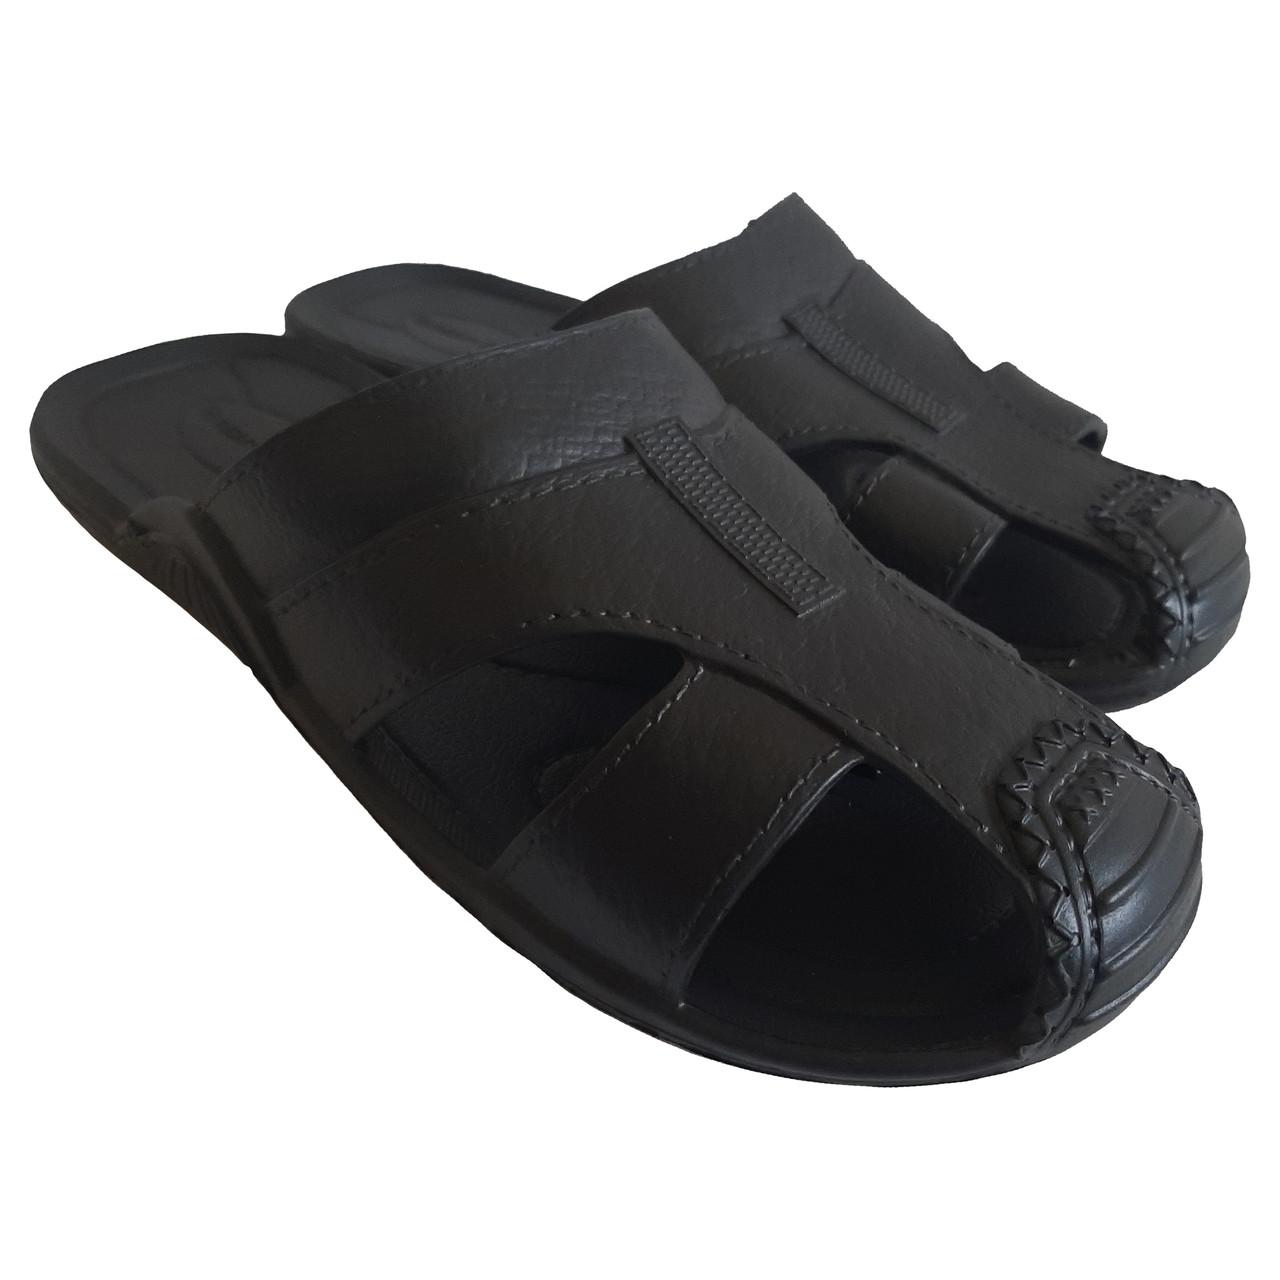 Мужские шлепанцы пвх, сланцы, пантолеты, обувь пена, мужская обувь впх, обувь Эва, обувь EVA